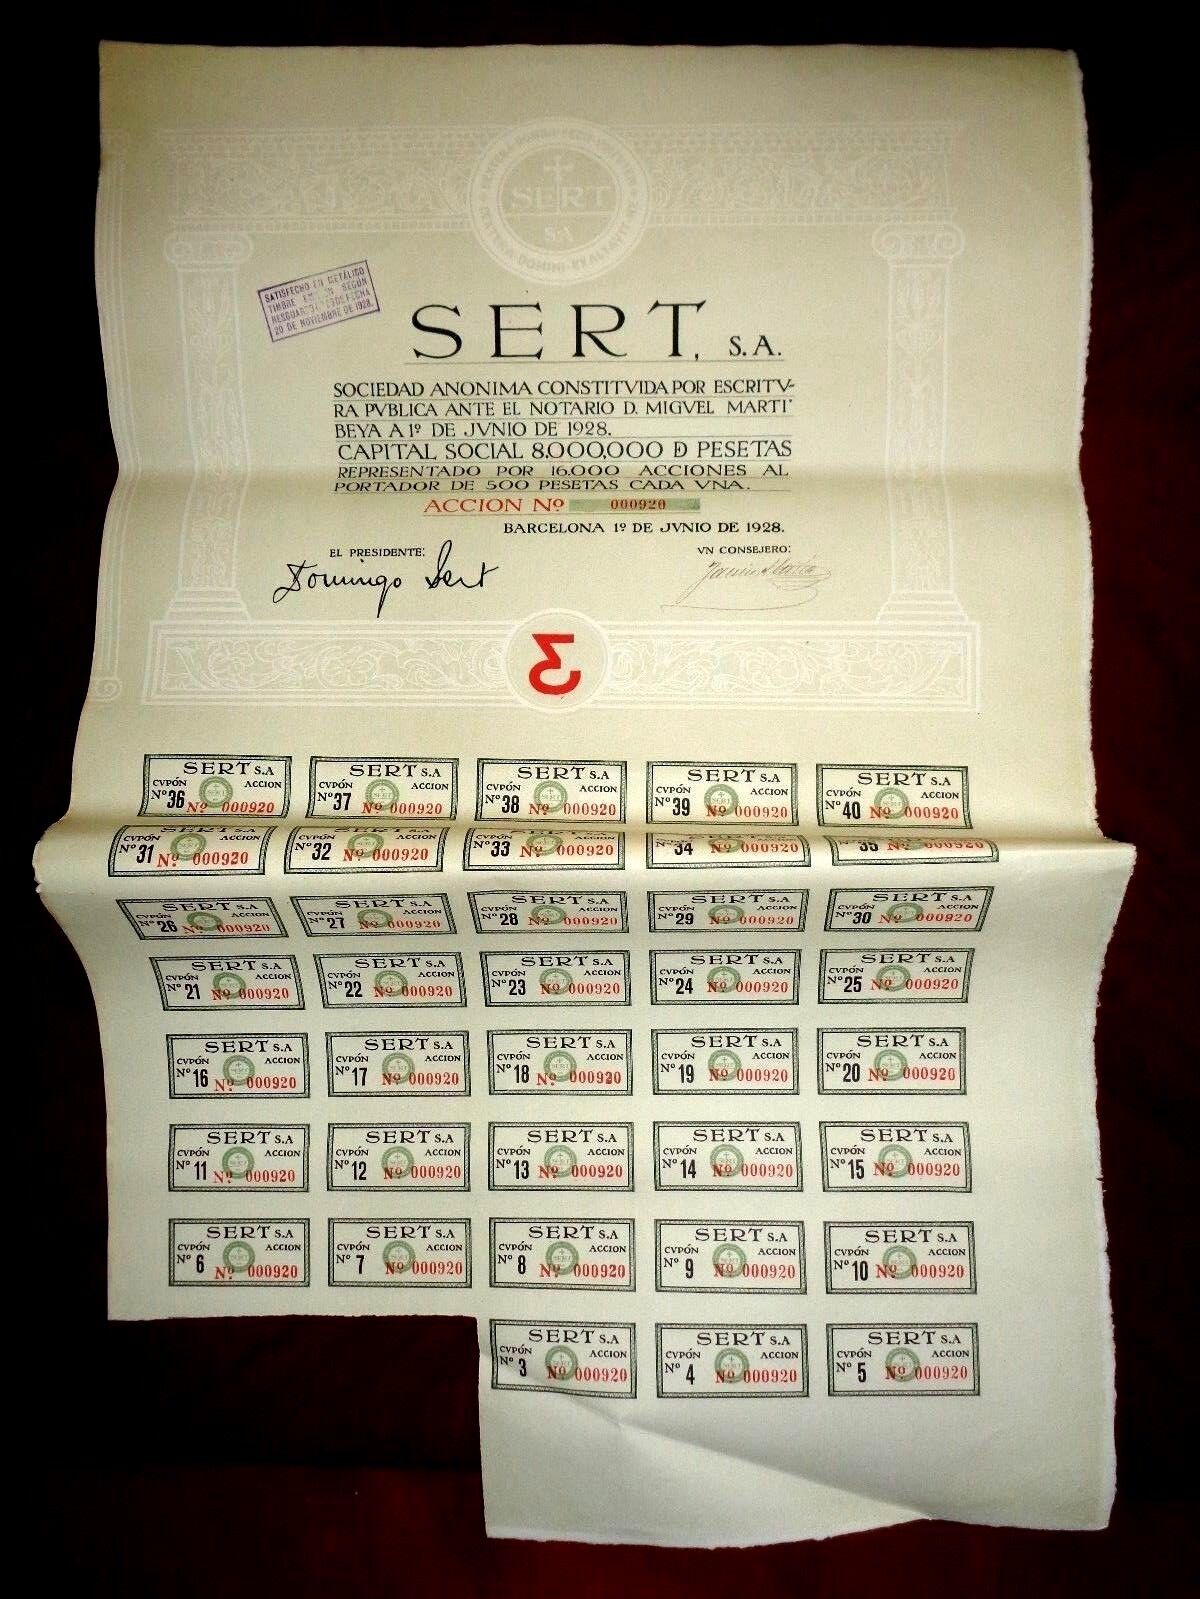 Sert ,SA,Barcelona 1928,Spain, share certificate.